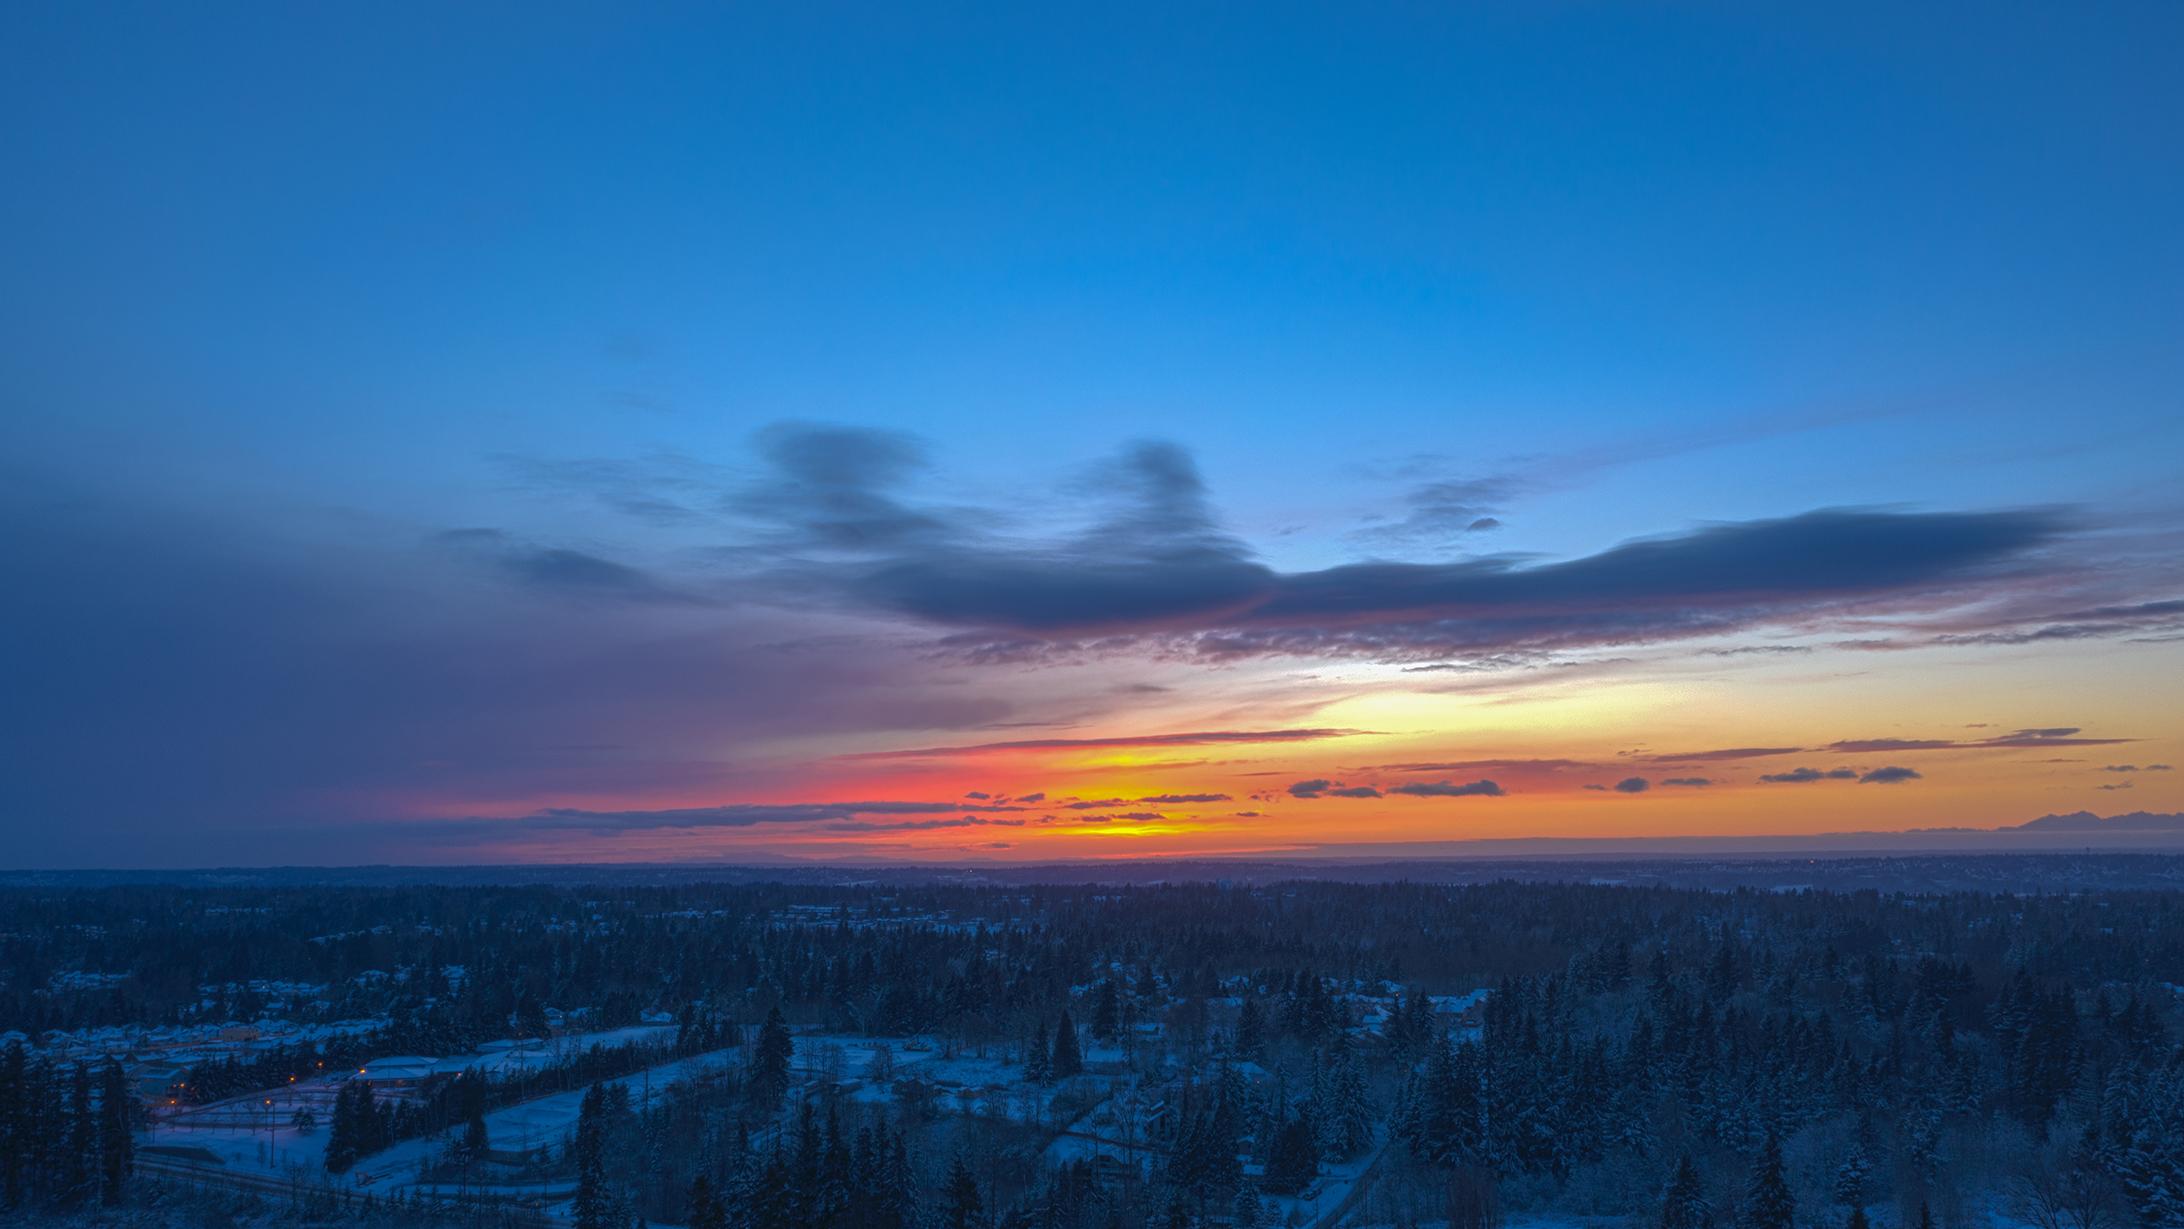 02_04_2019_Backyard_Snow_Sunset_02_SMALL.jpg